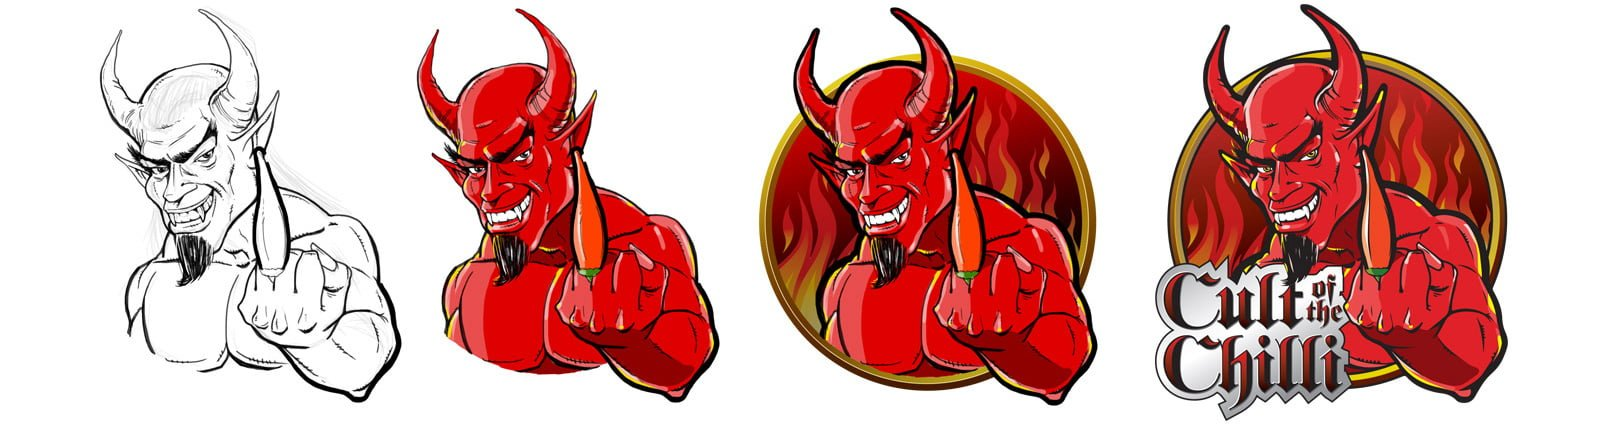 Cult of Chilli Logos by Zephyrmedia